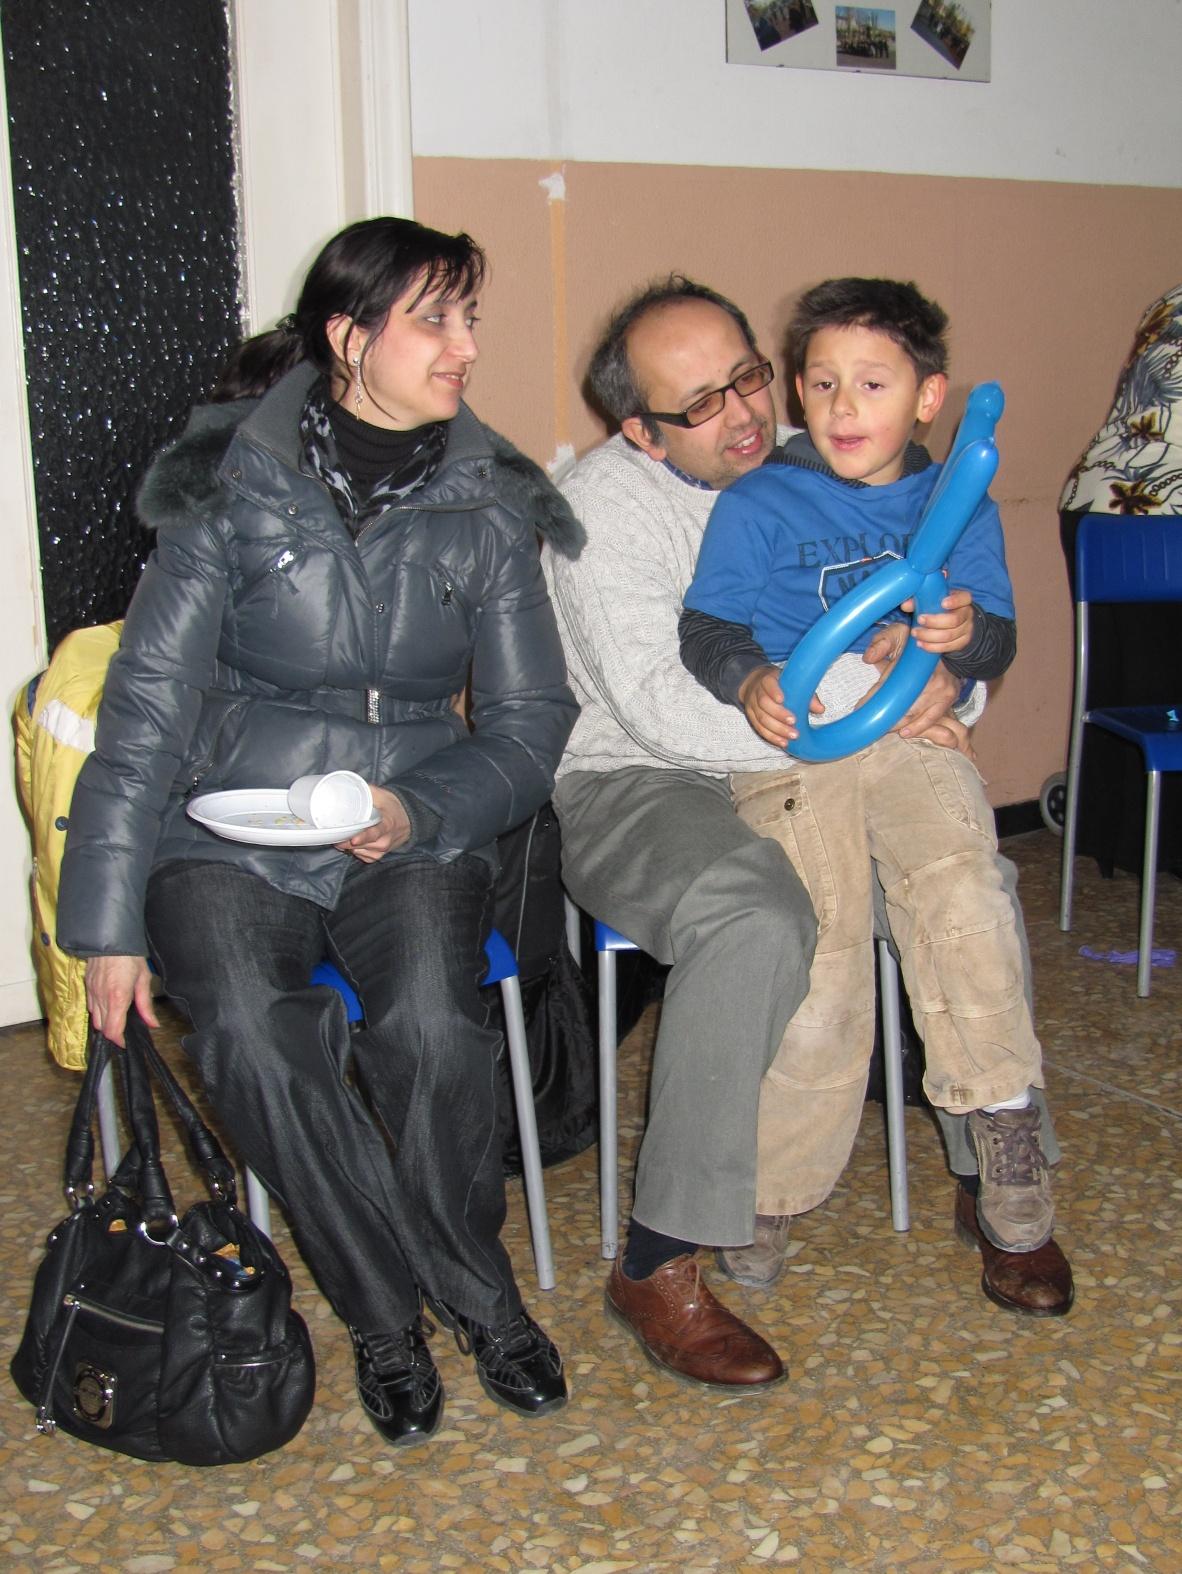 ricordo_battesimo_gesu_2011-01-23-16-56-54